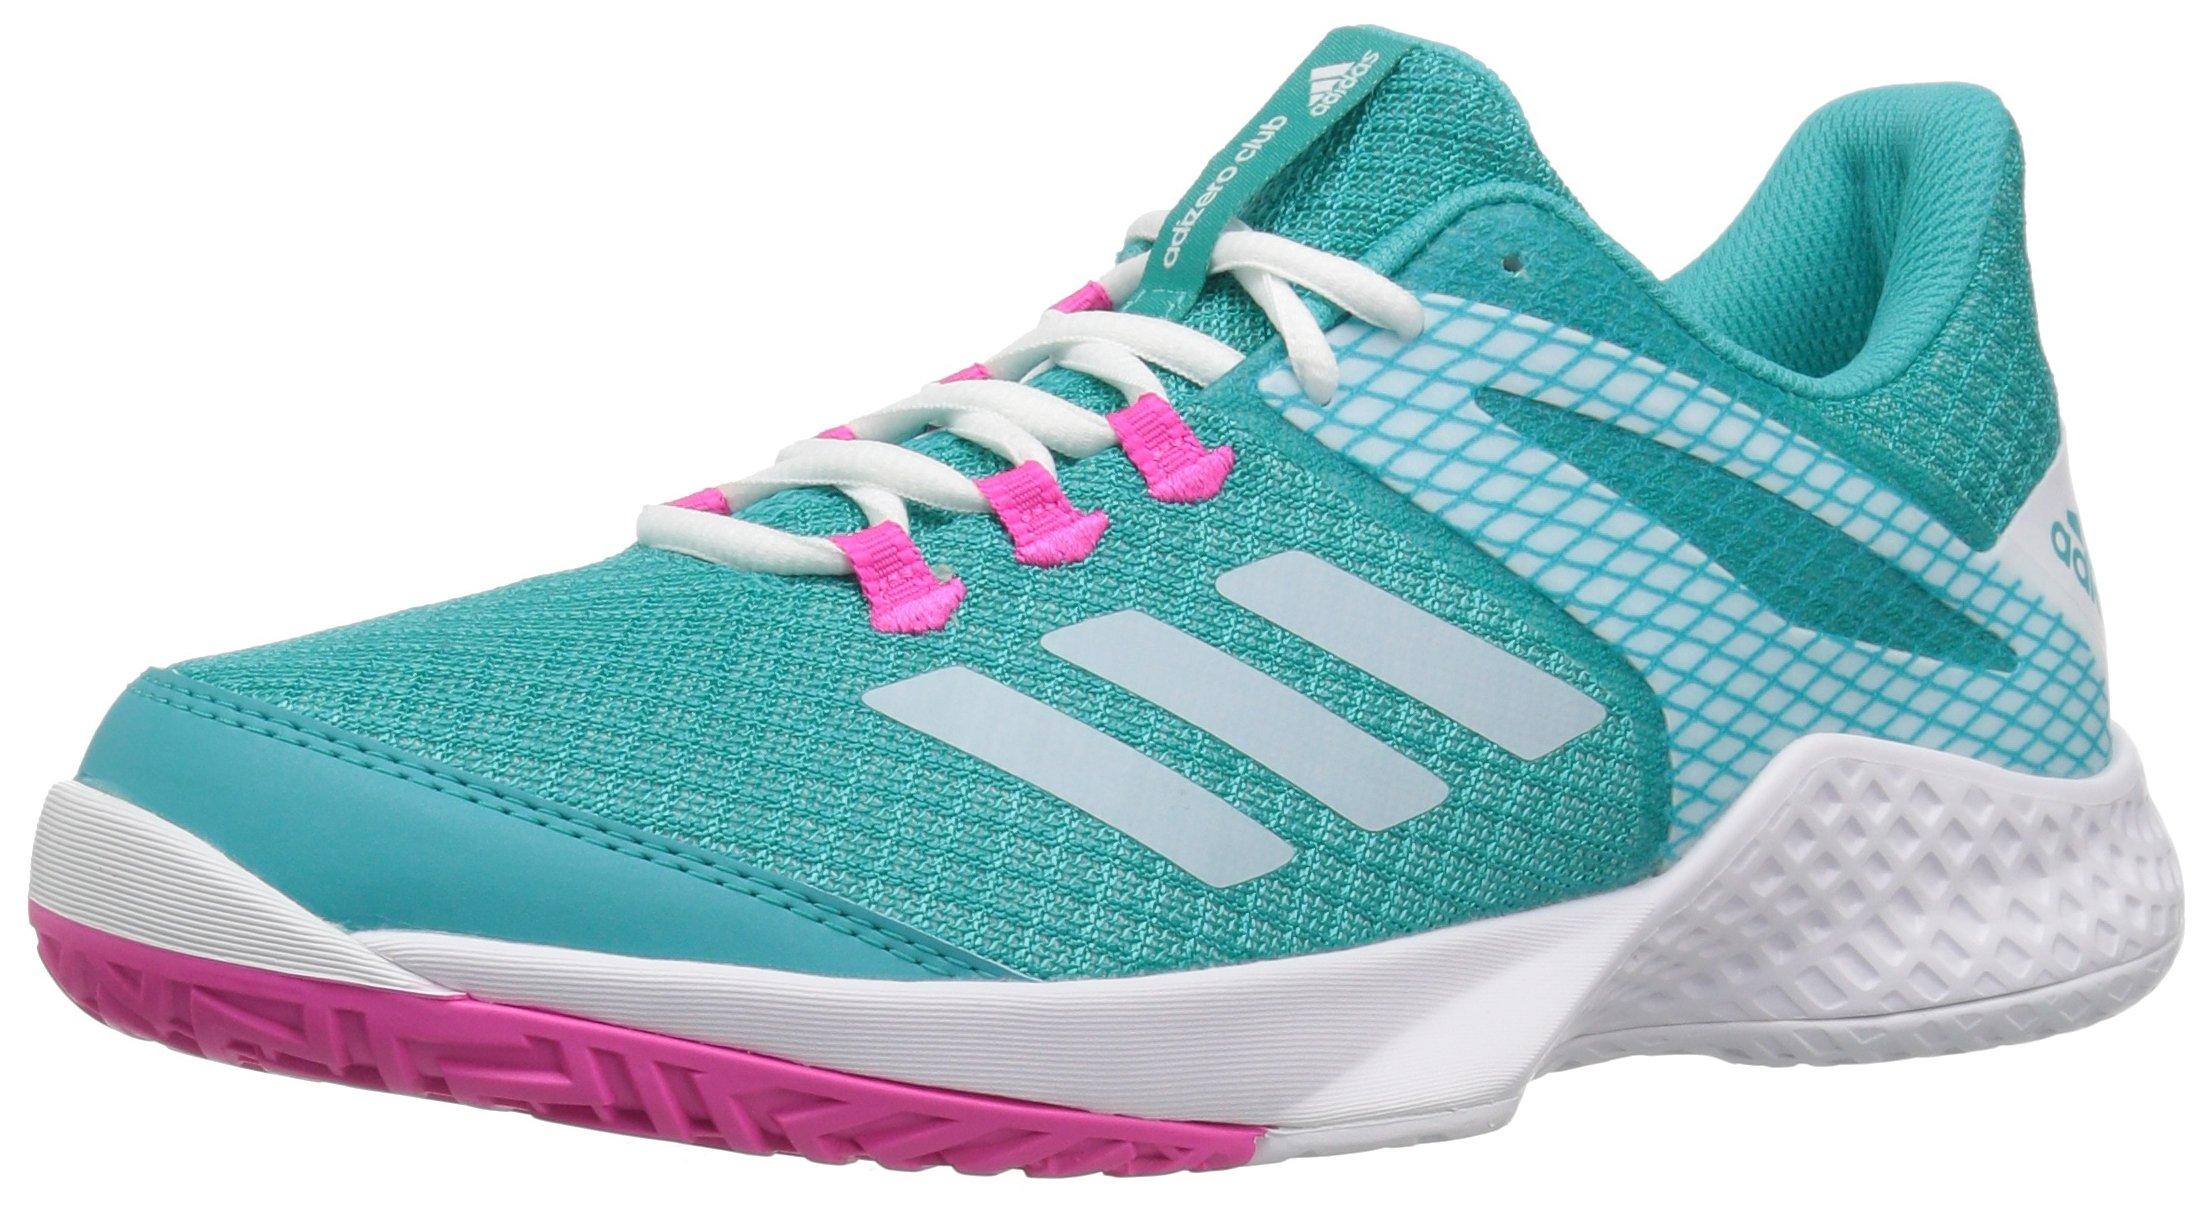 adidas Women's Adizero Club 2 Tennis Shoe, Hi-Res Aqua/White/Shock Pink, 9.5 M US